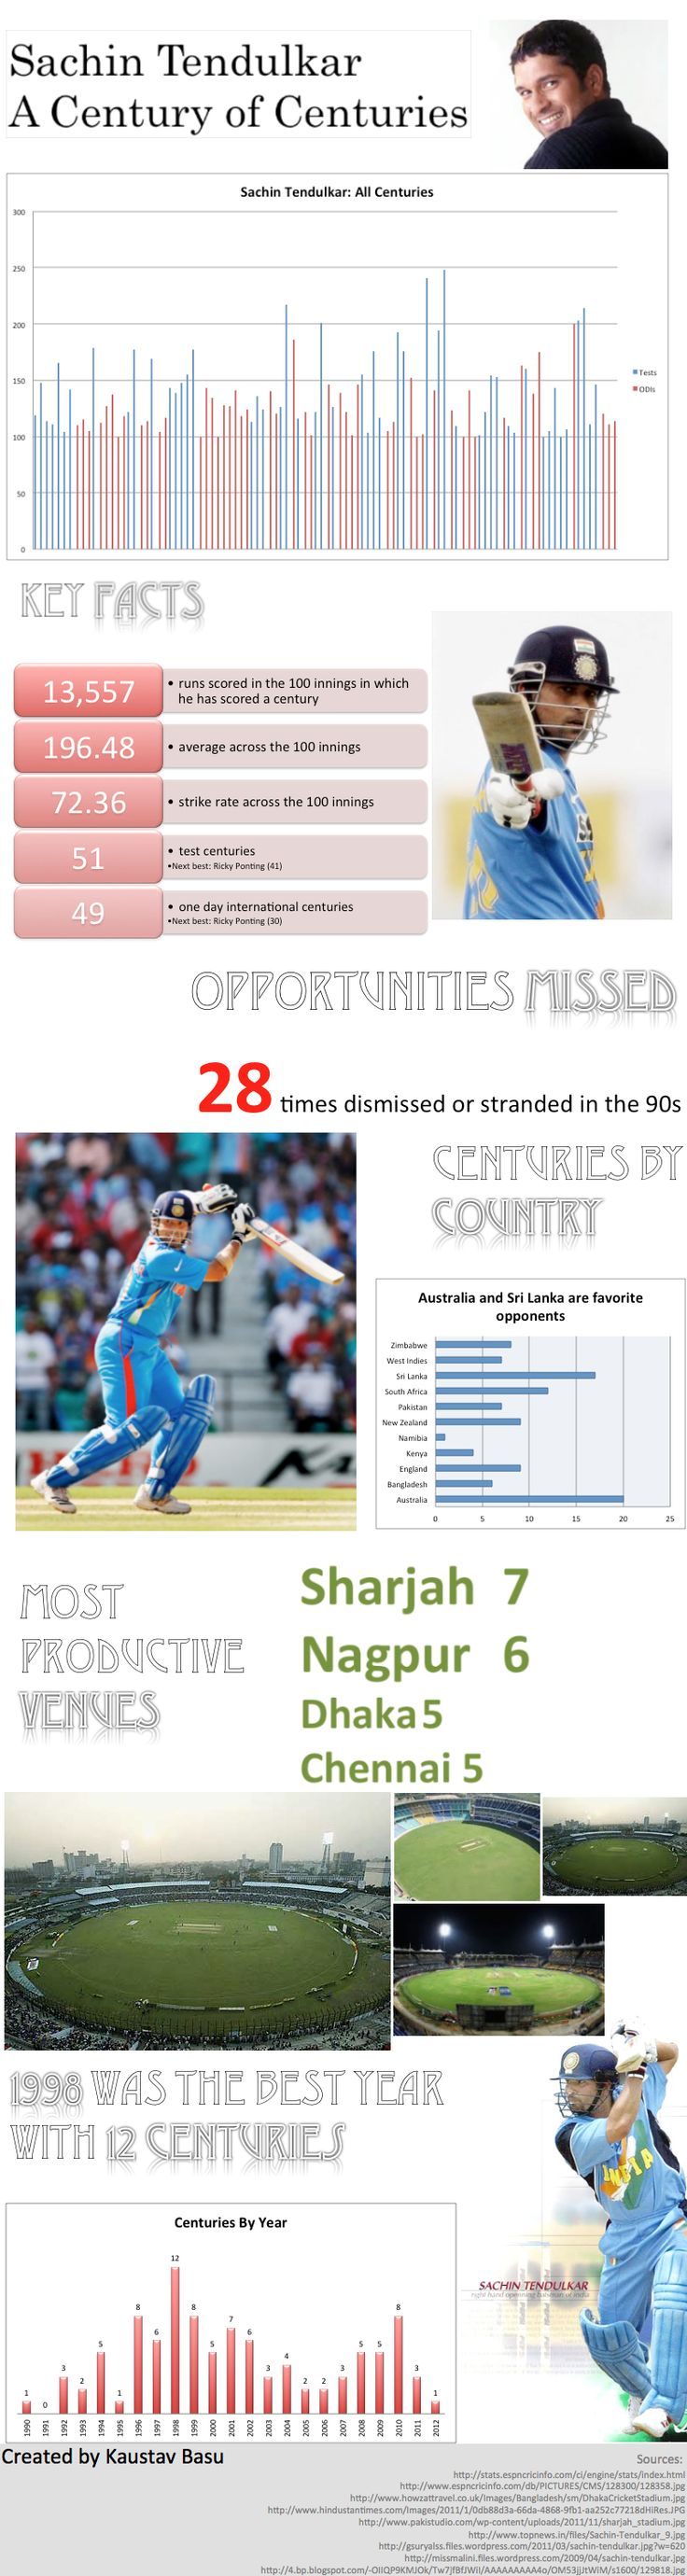 Sachin Tendulkar: A century of centuries #Sachin #Tendulkar #Century #Centuries #Cricket #Infographics #Sports